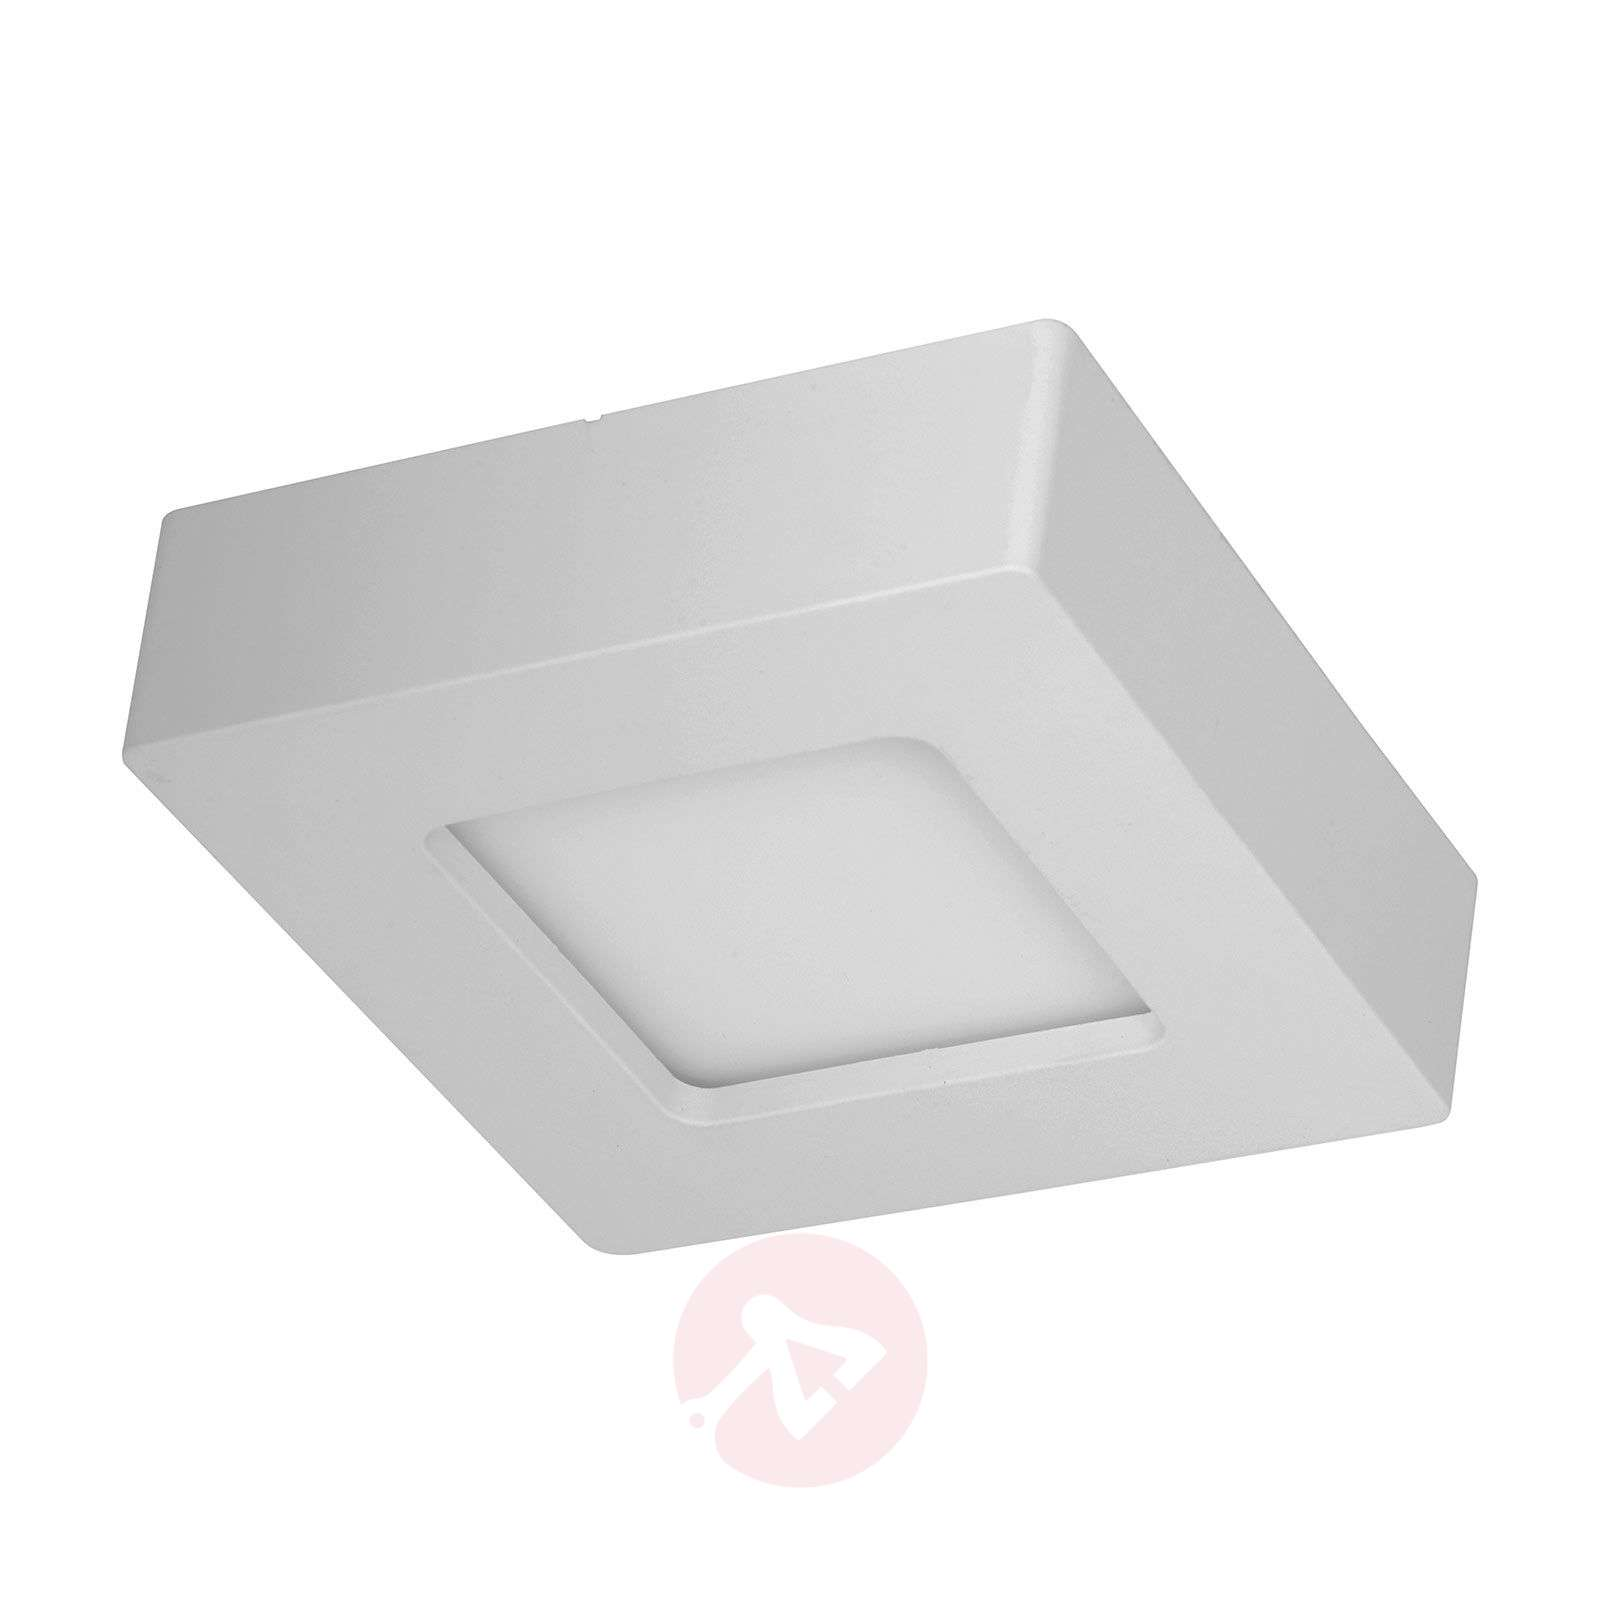 LED-kattovalo Marlo valk. 3000K kulmikas 12,8cm-9978093-02